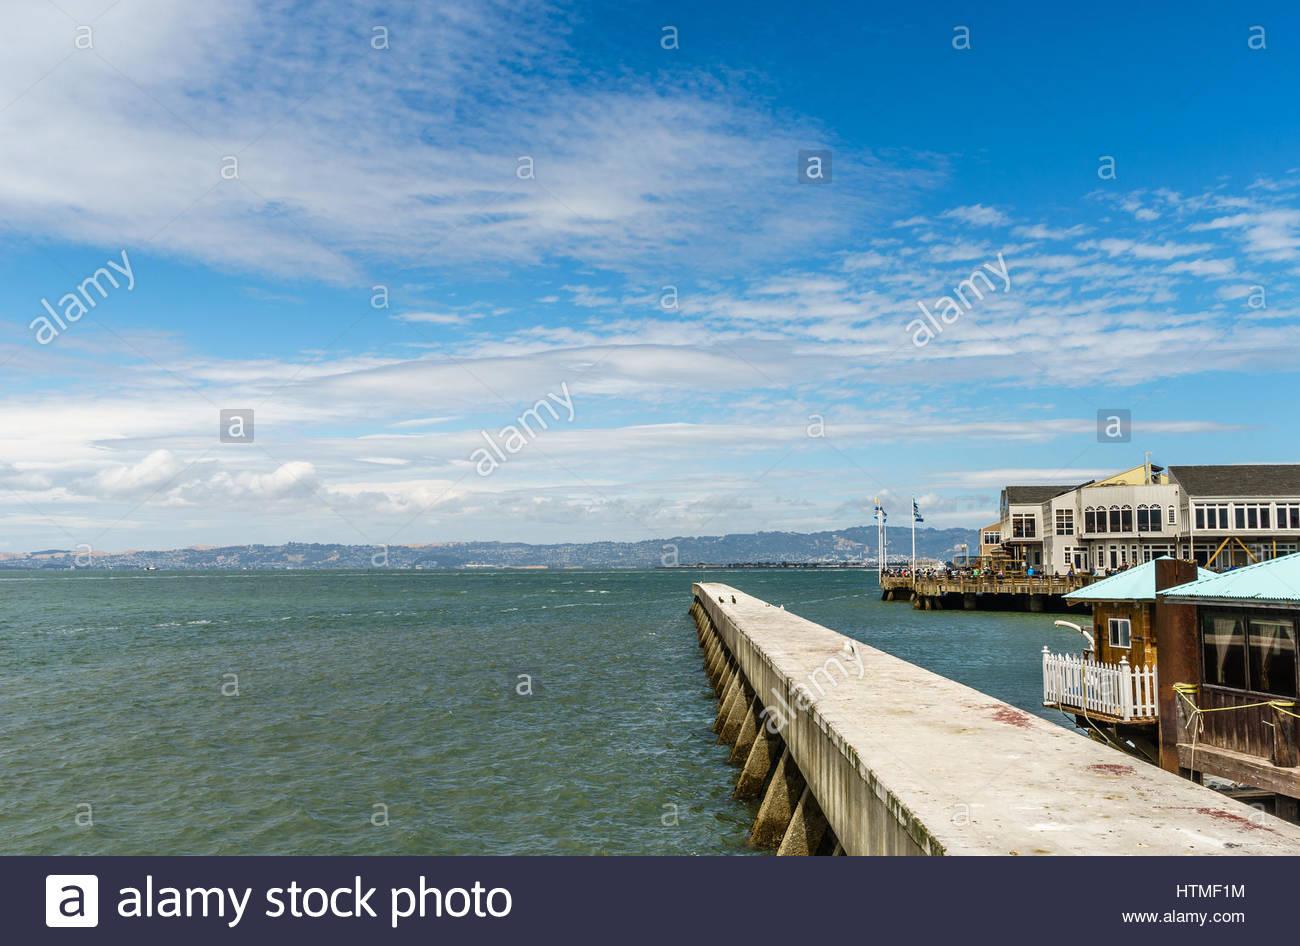 pier 39 san francisco - Stock Image